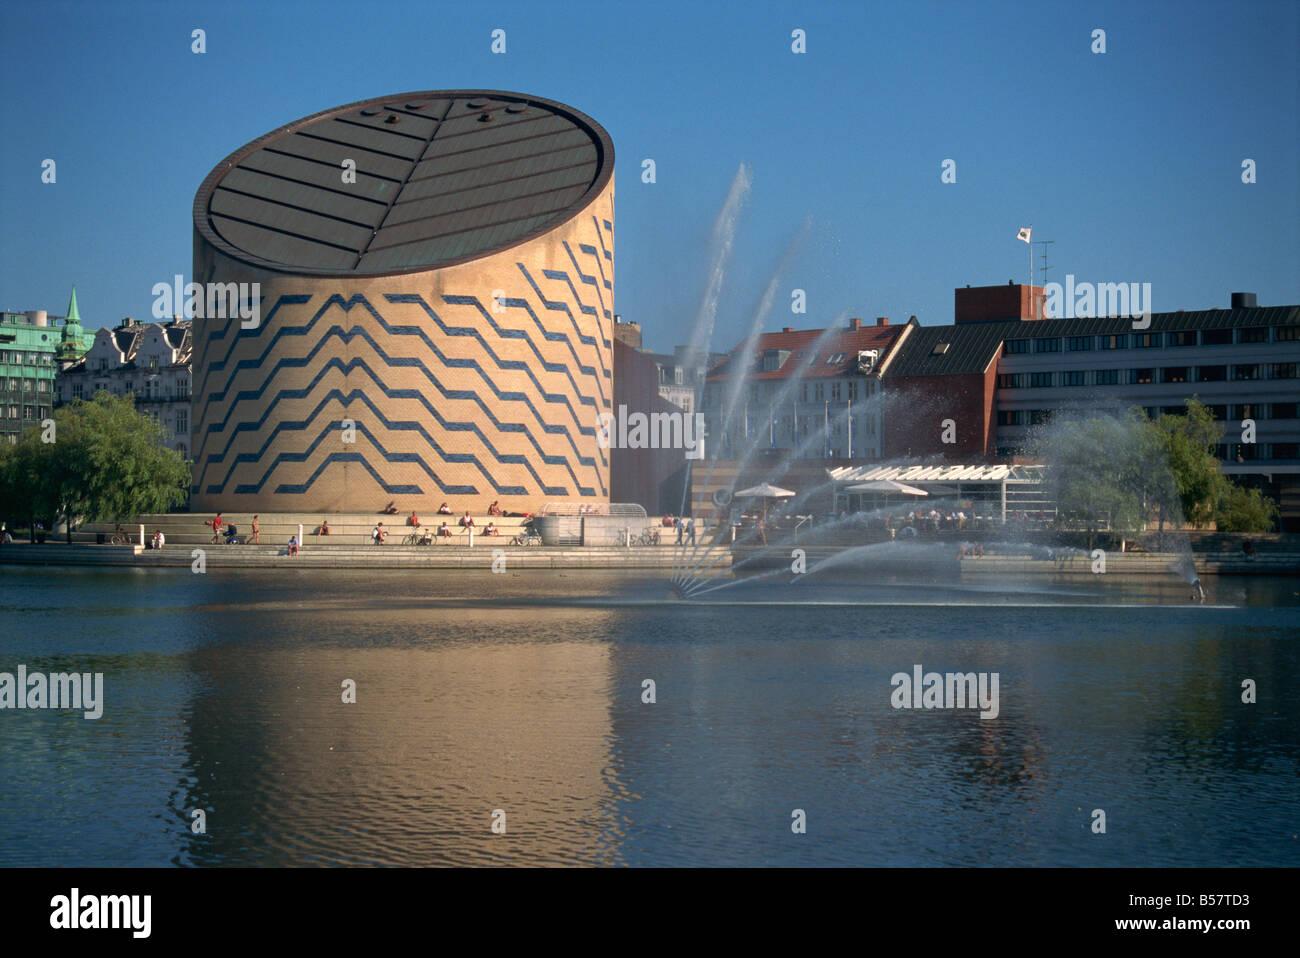 The Tycho Brahe Planetarium, Copenhagen, Denmark, Scandinavia, Europe - Stock Image